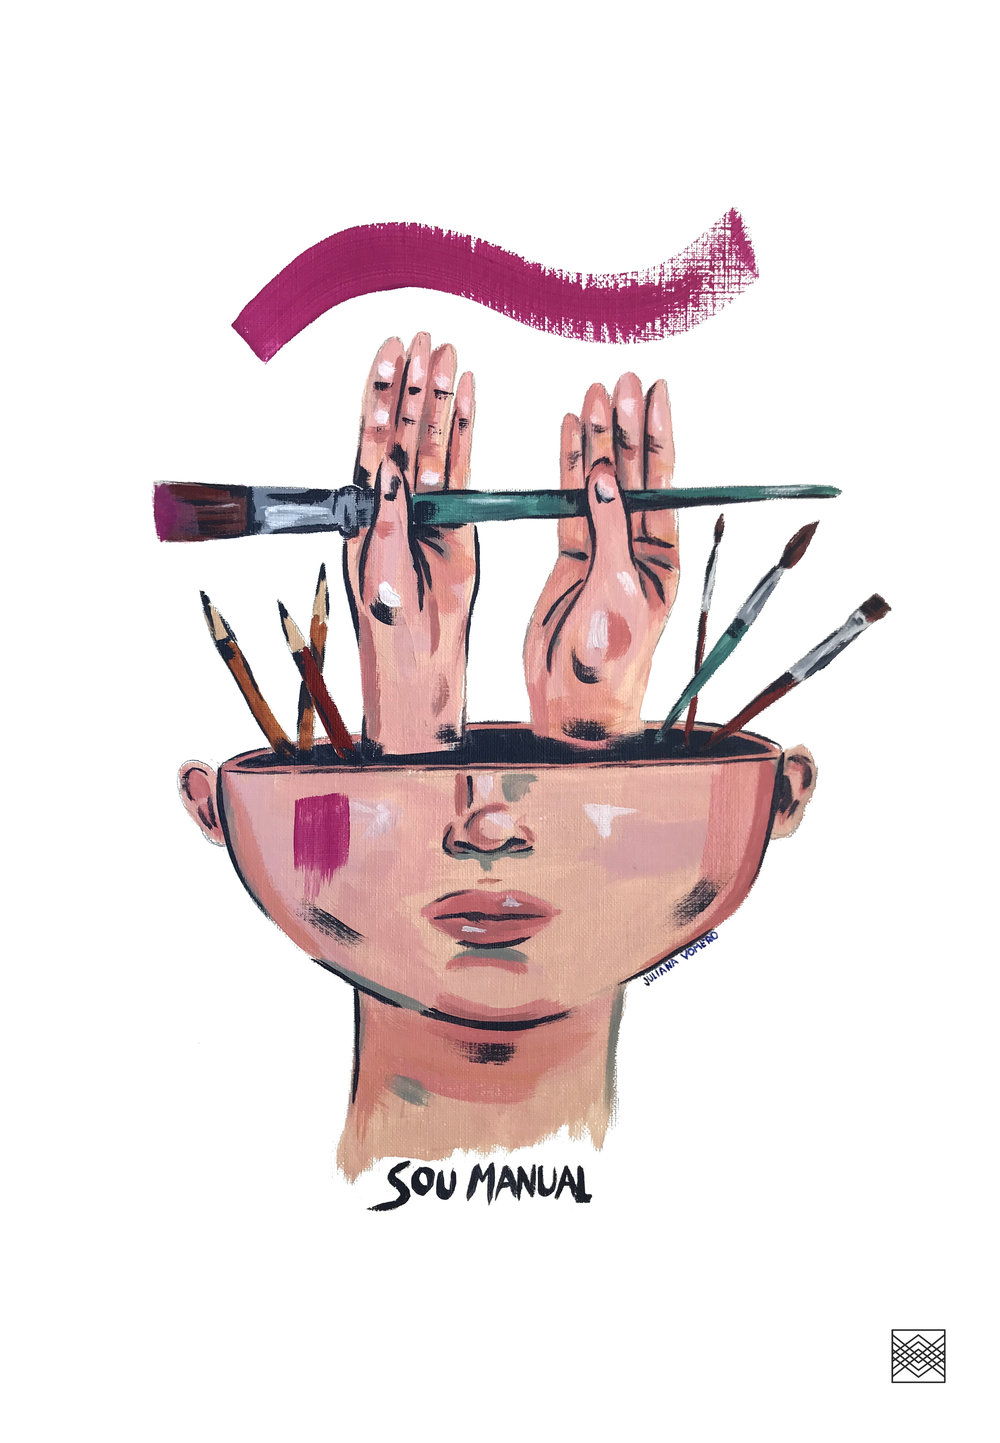 soumanual_arte.jpg